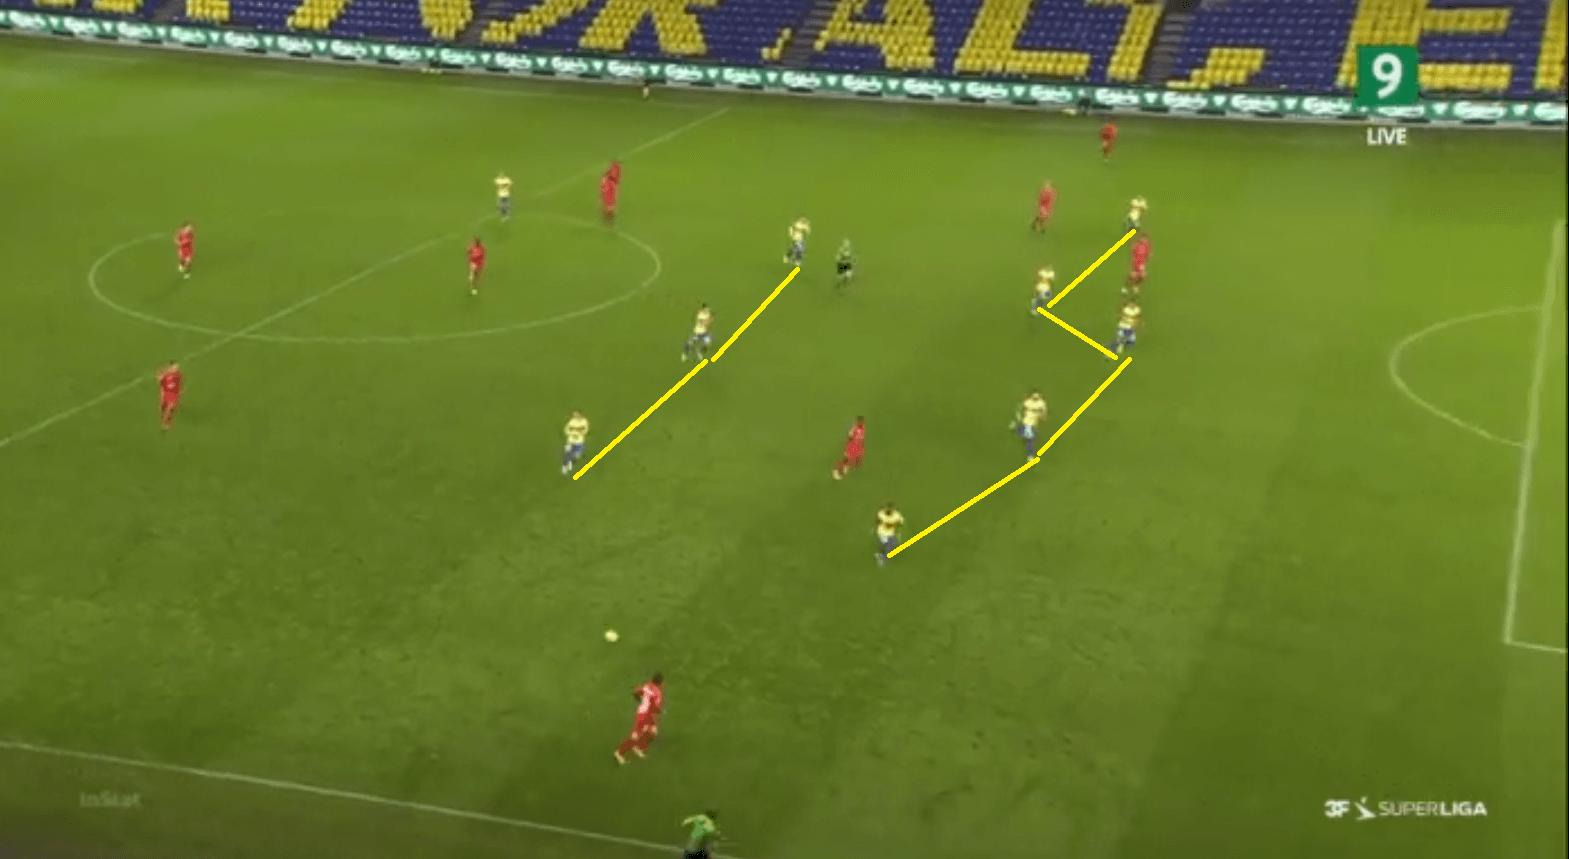 Danish Superliga 2020-21: Brondby vs Midtjylland - tactical analysis - tactics